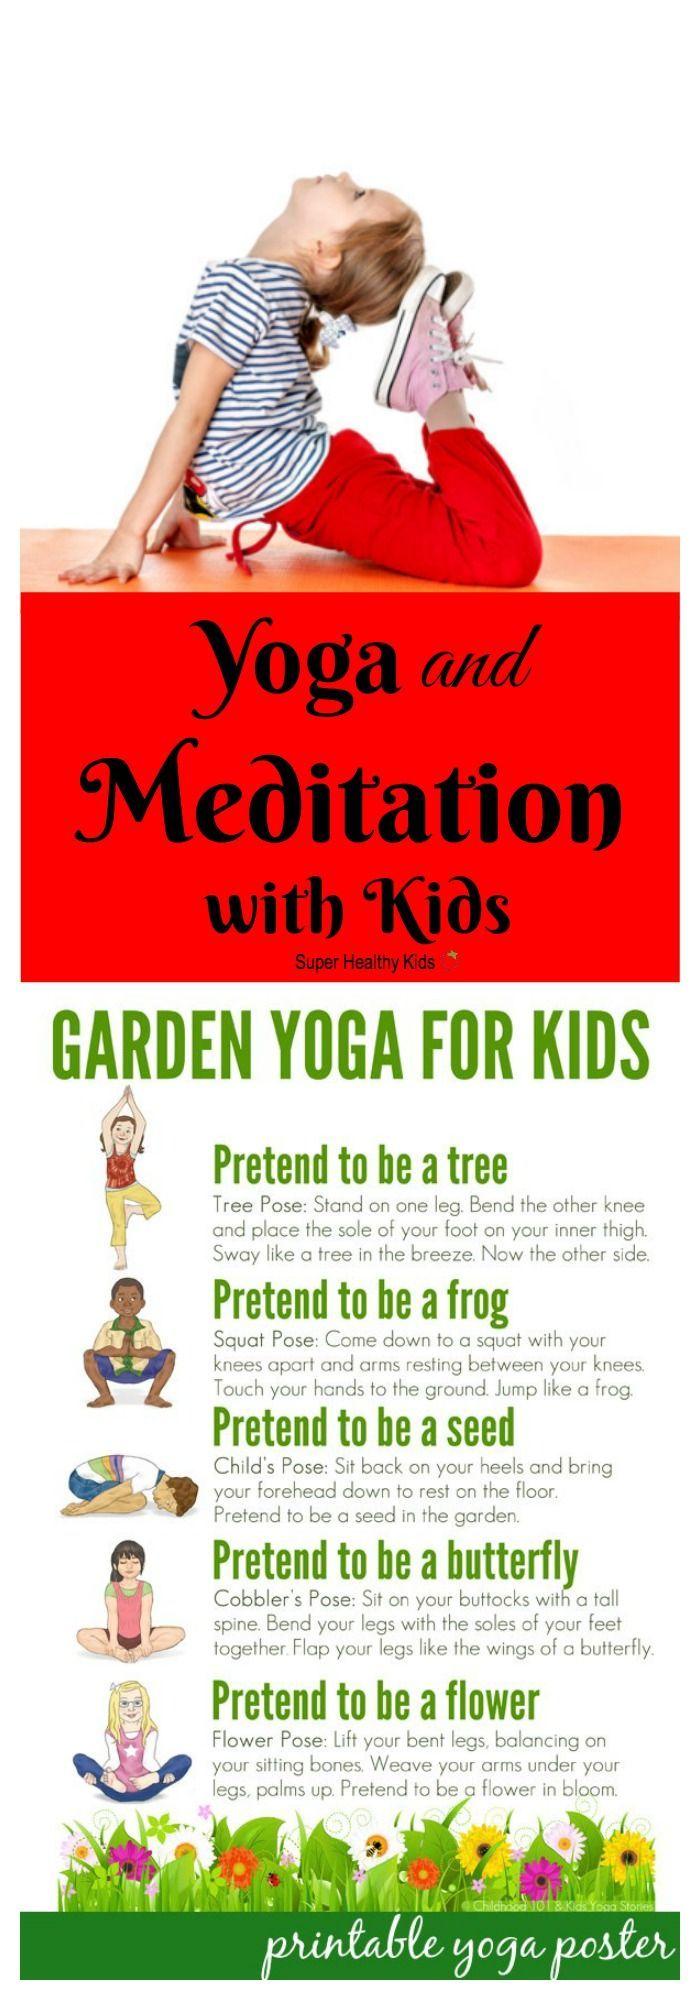 #definitely #should #teach #best #yoga #kids – yoga